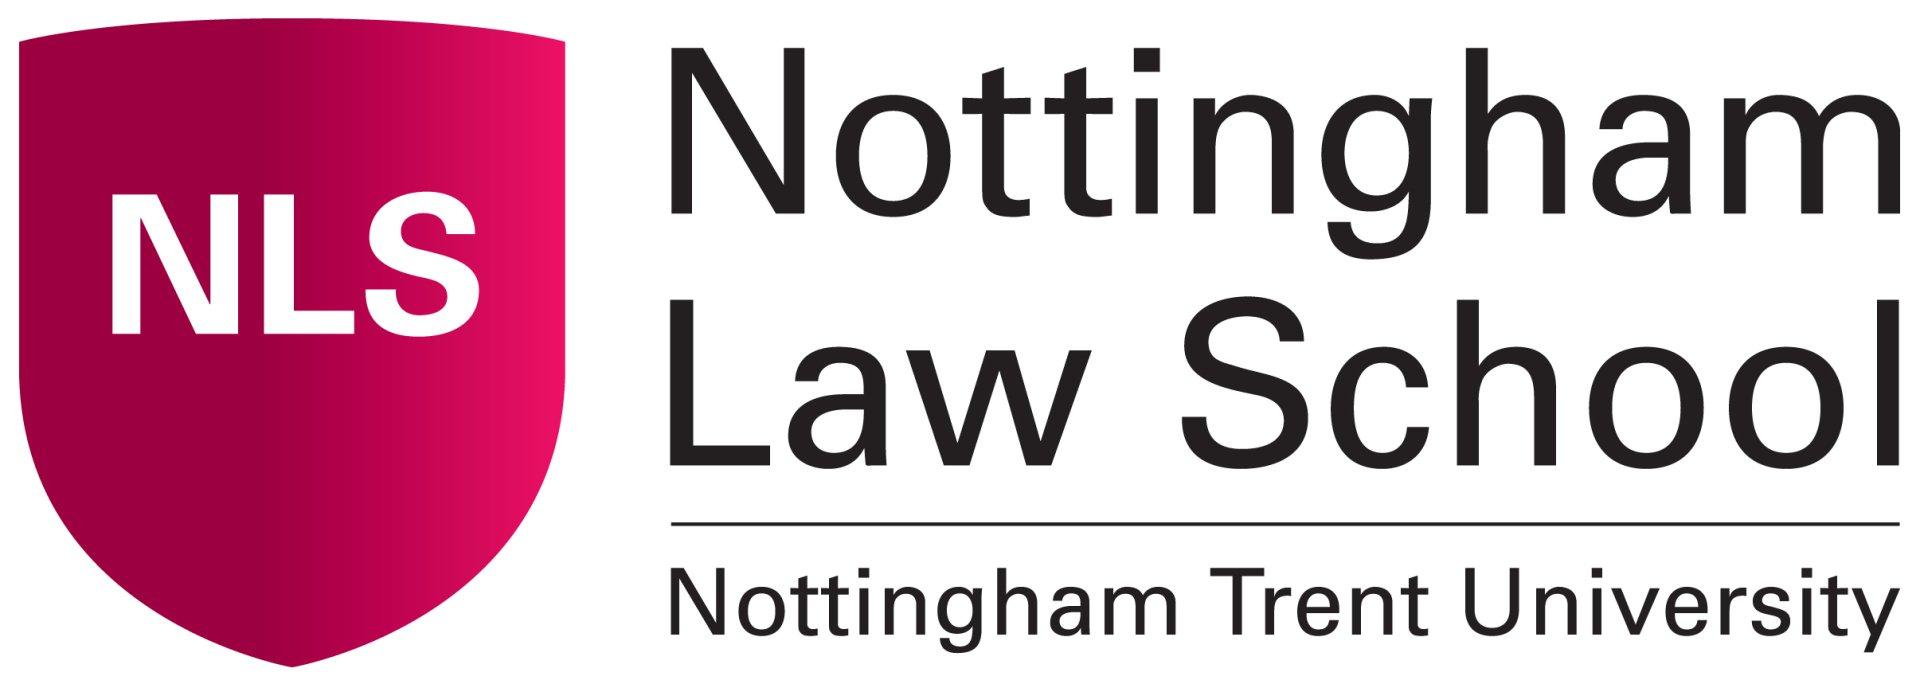 Civil-Commercial Mediation Training | UK NLS